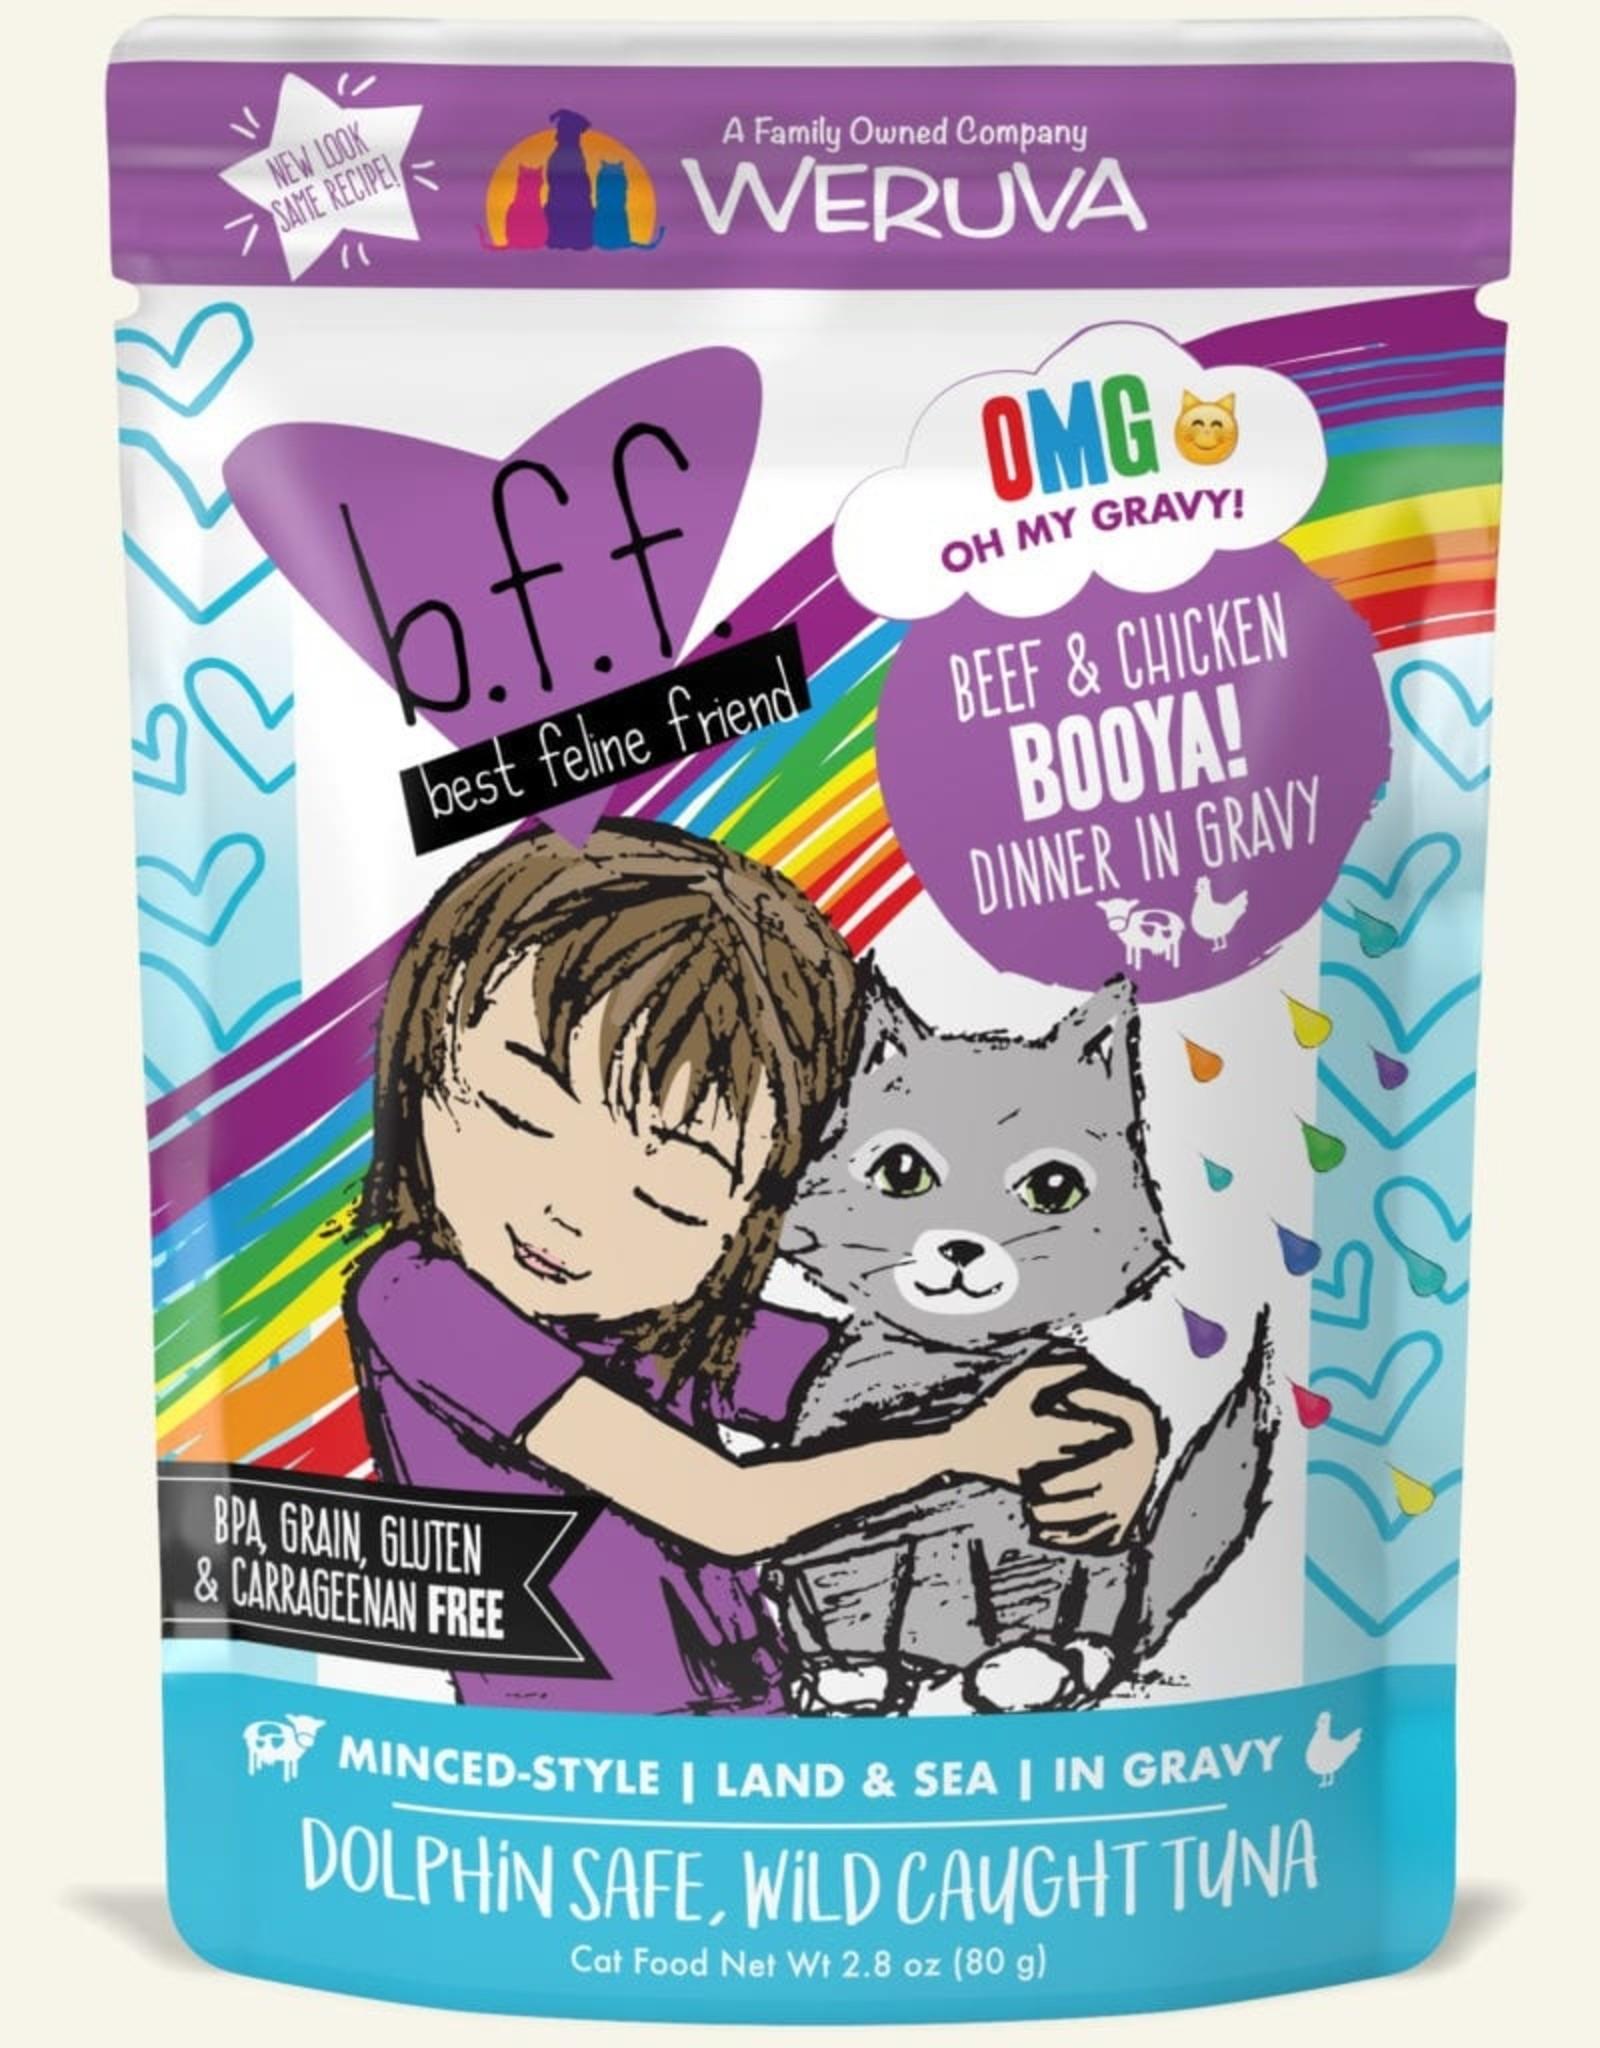 WERUVA Cat BFF Booya Minced - Grain-Free 2.8oz